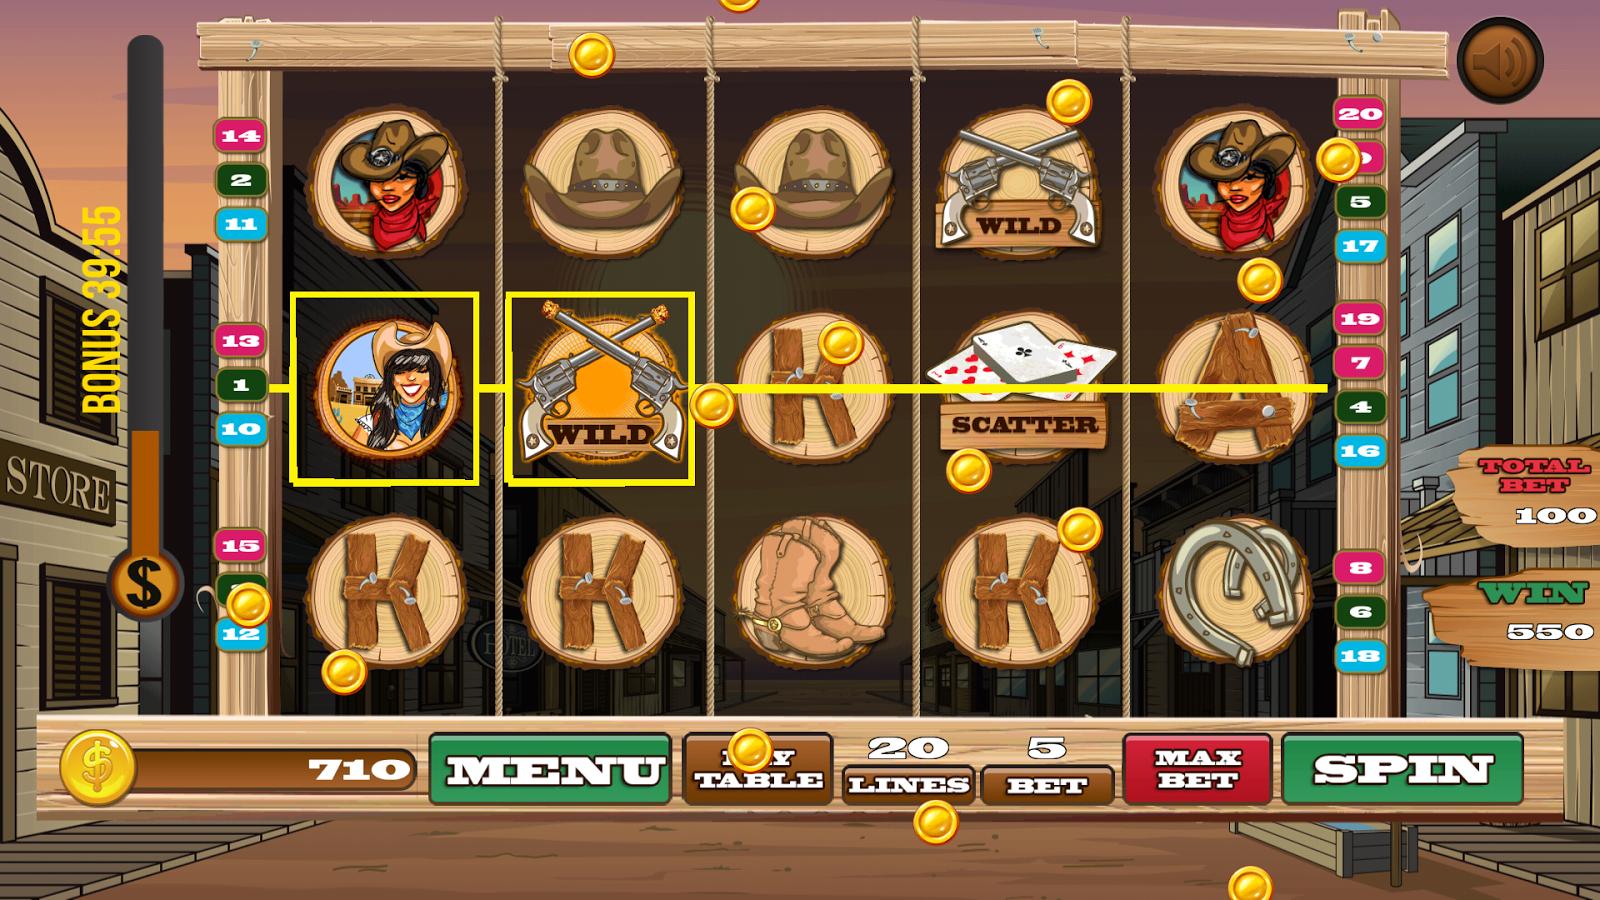 Software per ingannare slot machine